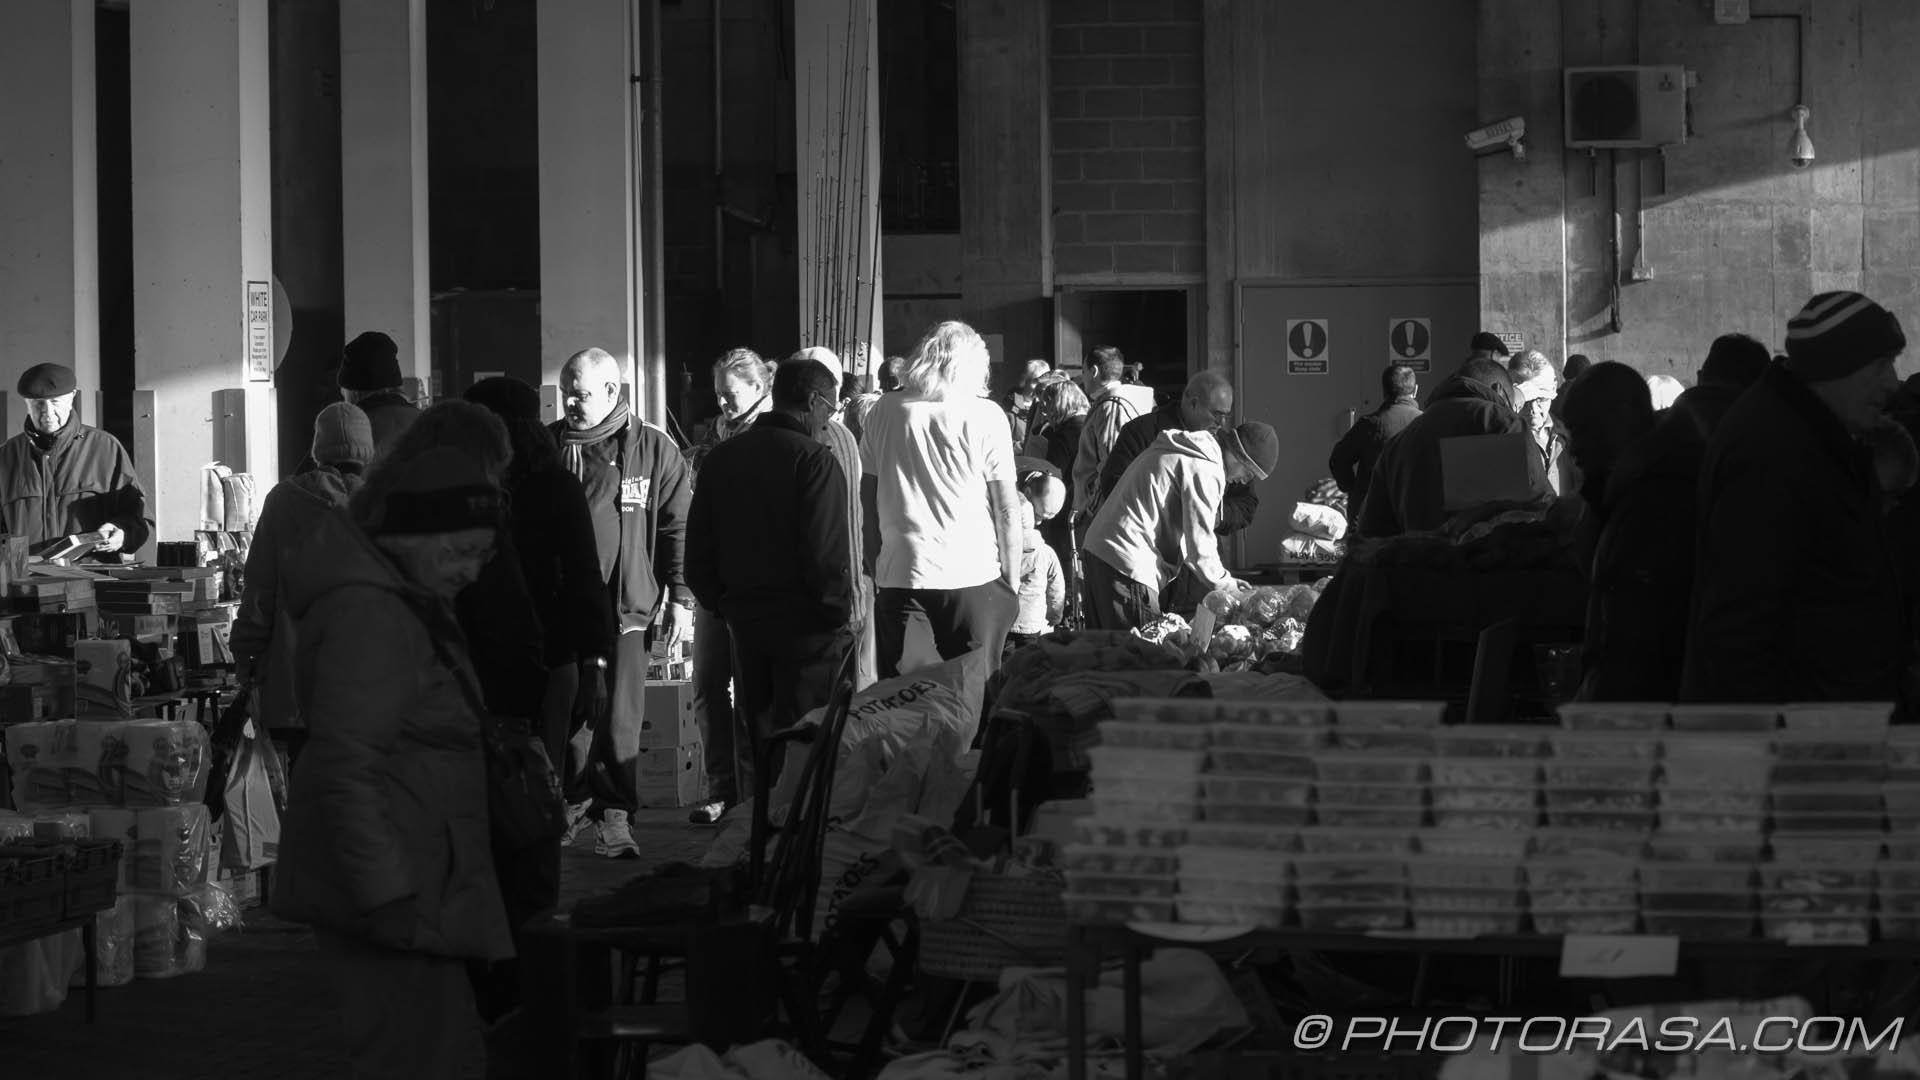 http://photorasa.com/maidstone/crowds-at-maidstone-market/